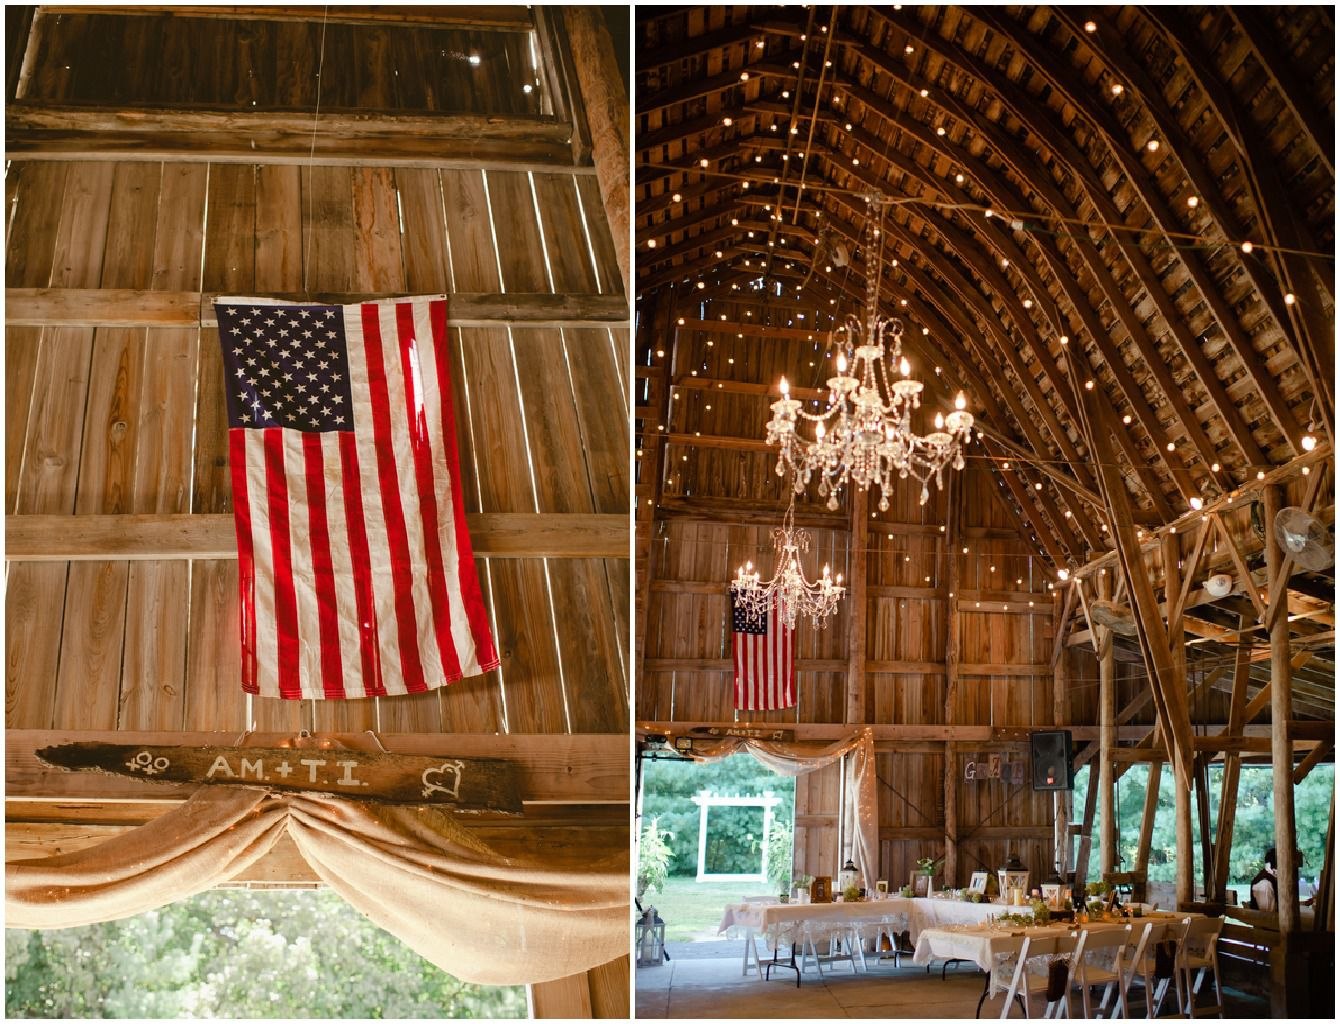 rustic wedding lighting ideas. Elegant Barn Wedding WIth LIghts Rustic Lighting Ideas